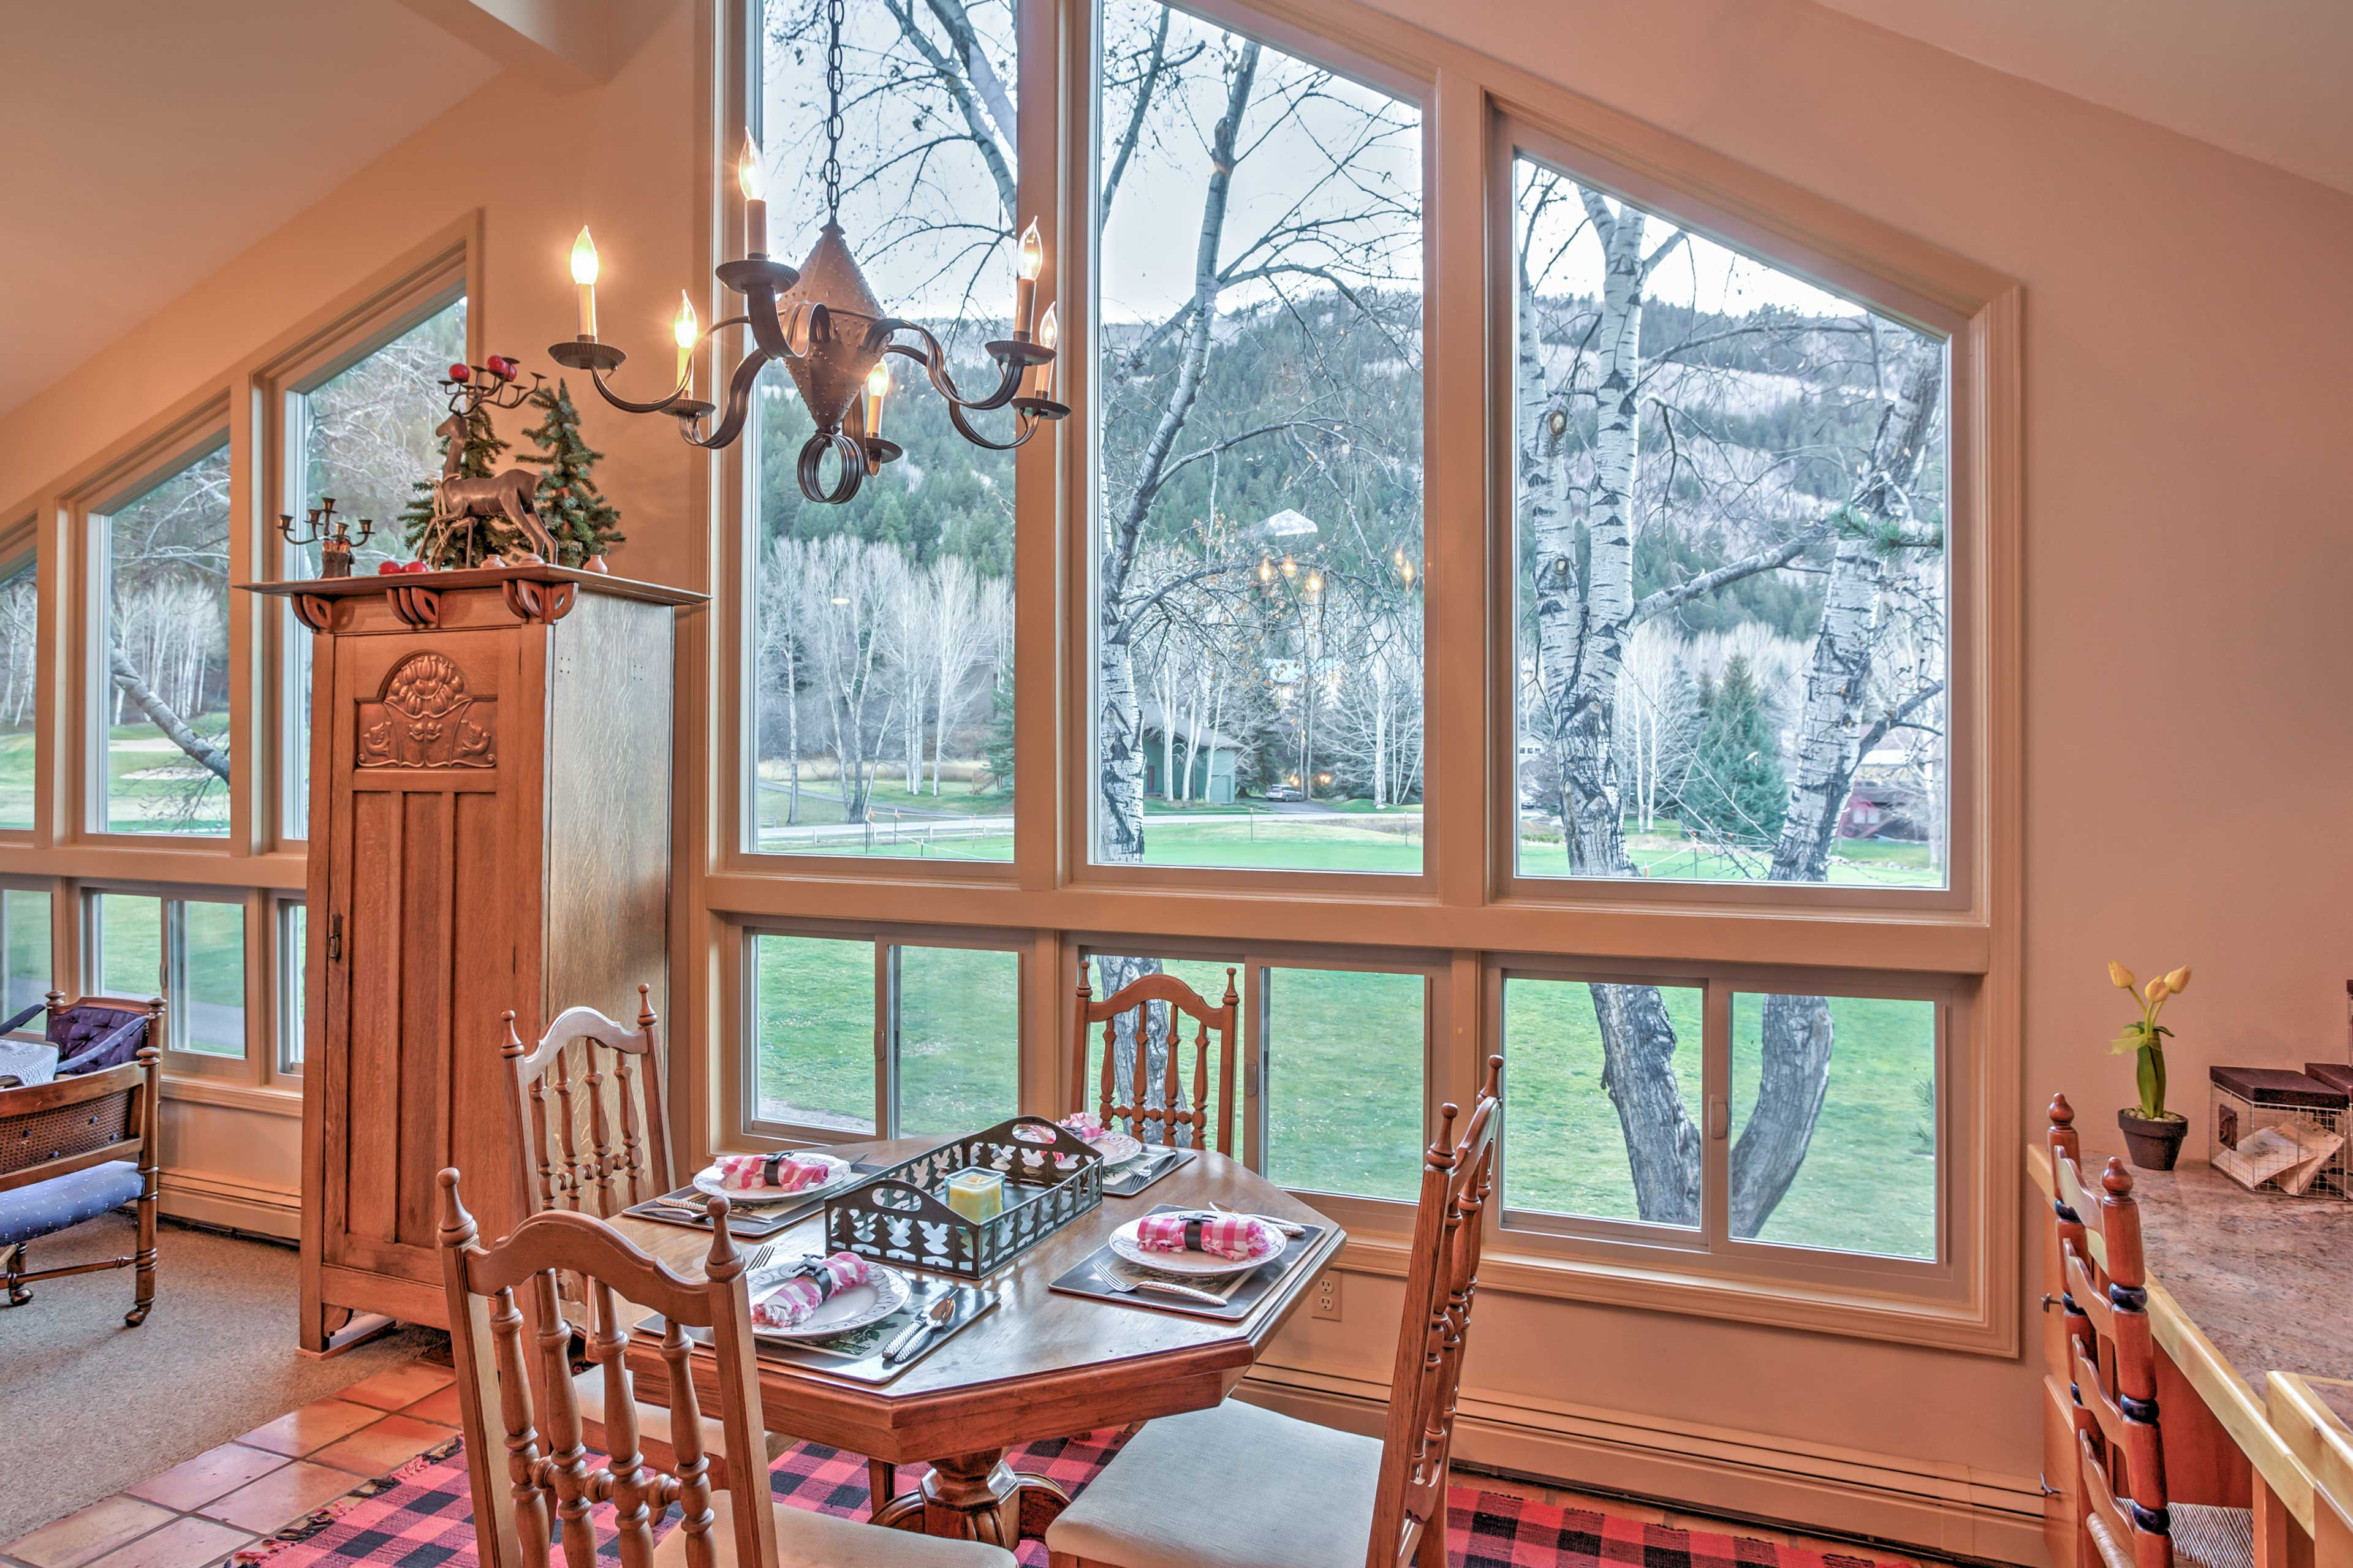 Enjoy picturesque views through the massive windows.